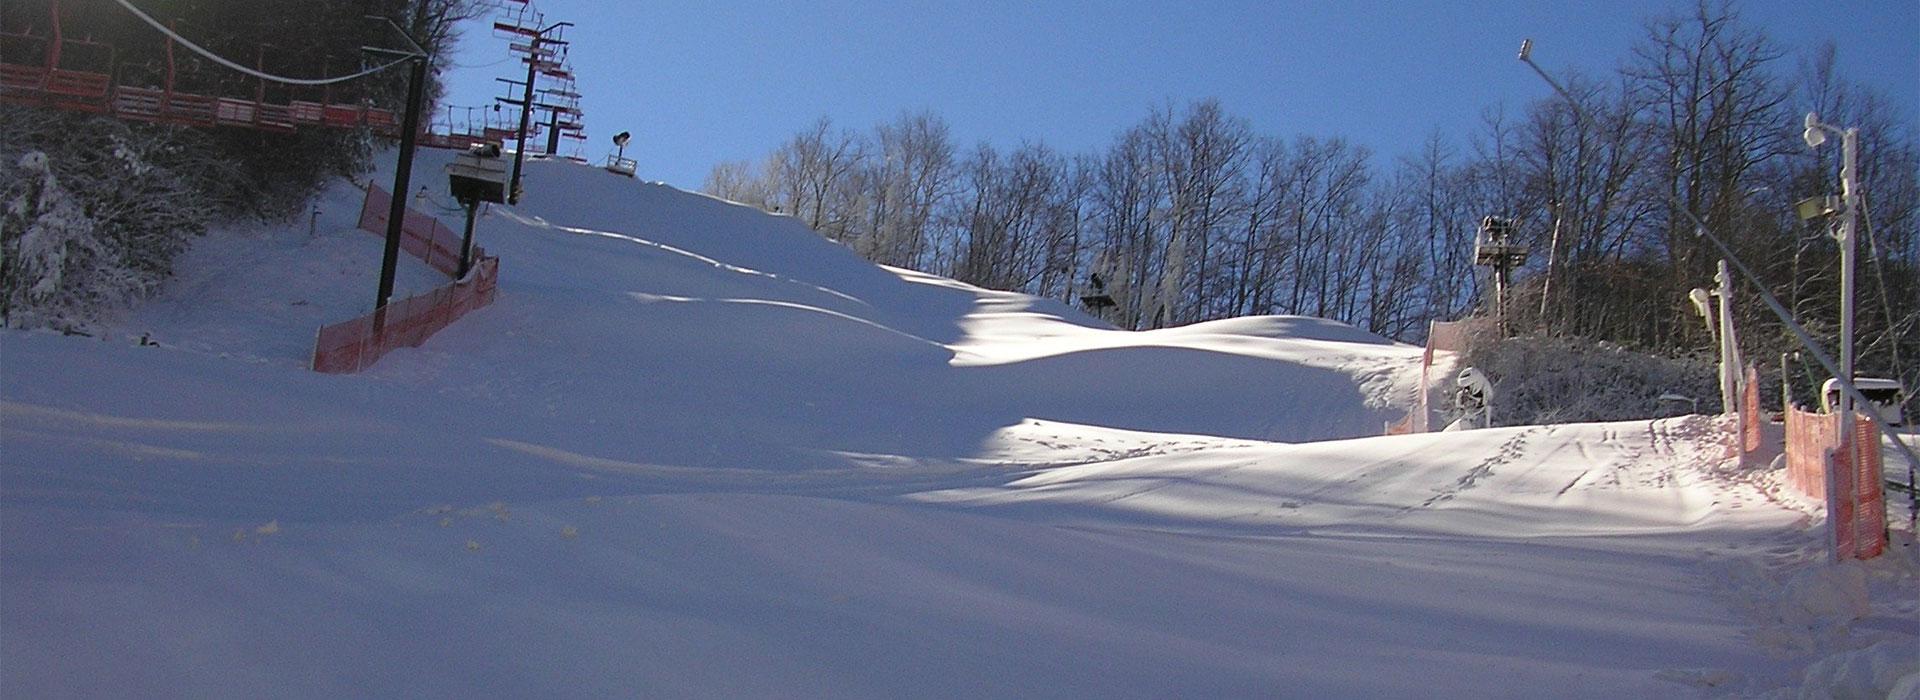 Ober gatlinburg weather for Boone ski cabin rentals